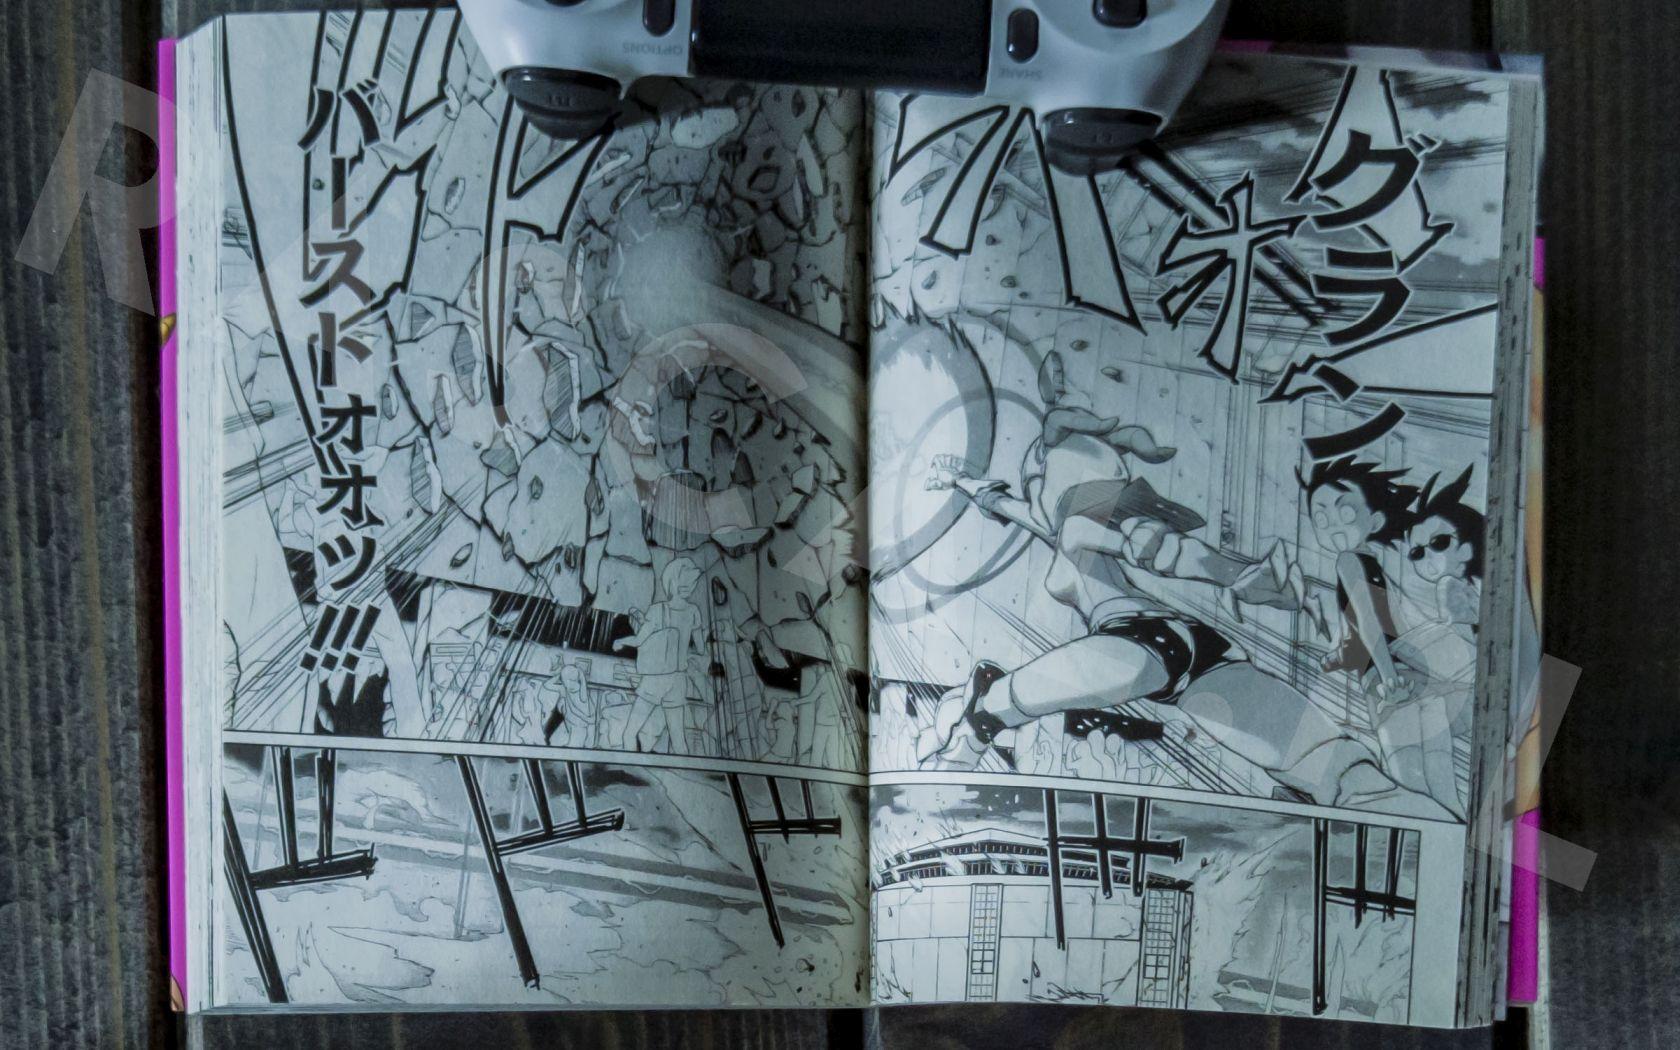 Momoiro Armet (1-2) - Young Jump Comics Ultra - Nowości w kolekcji mangi (listopad 2020) - rascal.pl